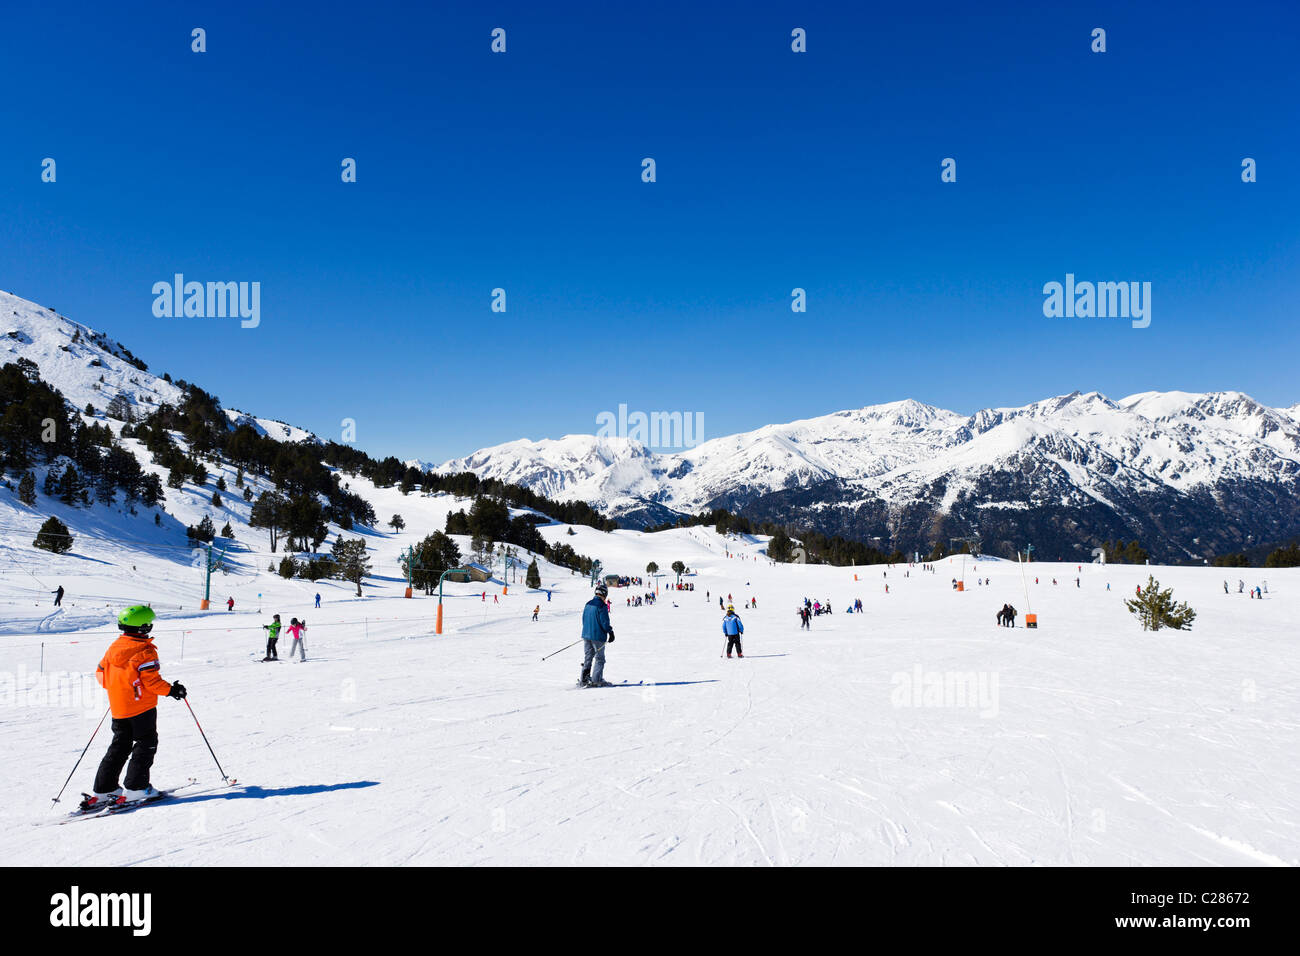 Skiers on the nursery slopes in the Espiolets ski area, Soldeu, Grandvalira Region, Andorra - Stock Image